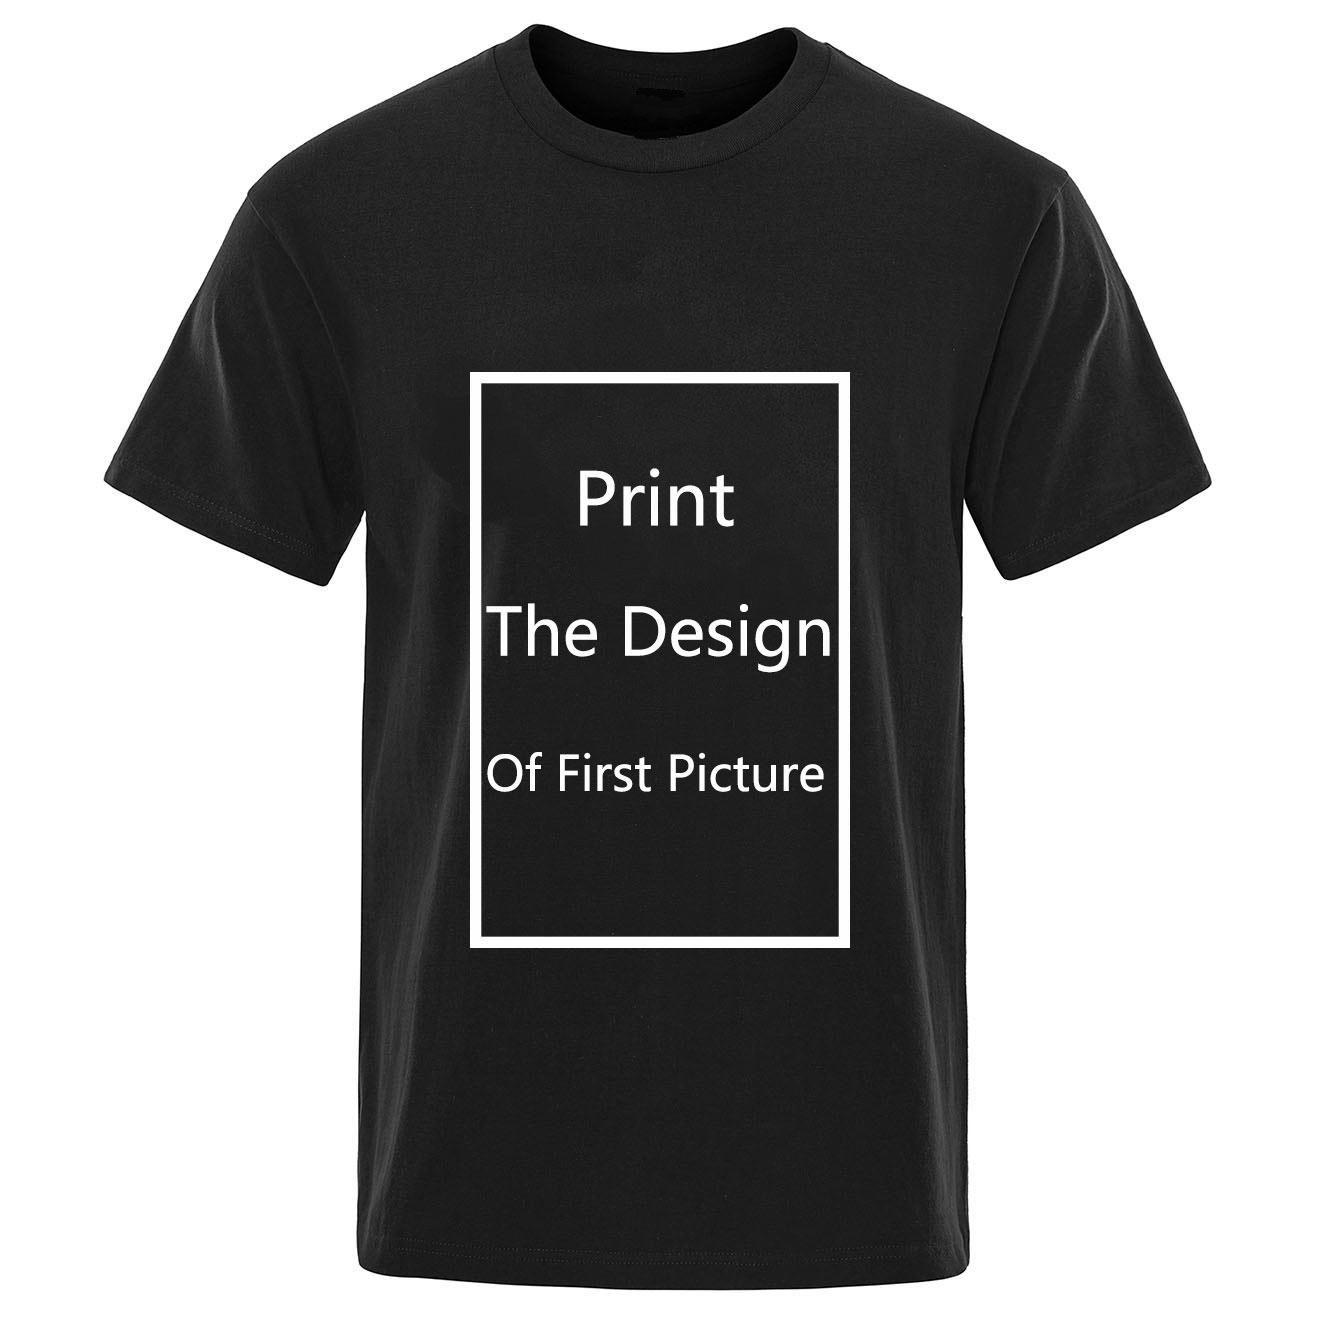 Backstreet Boys T Shirt Backstreet Boys DNA World Tour T-Shirt Long T-Shirt Sweatshirt Hoodie Short Sleeve O-Neck Cotton T shirt